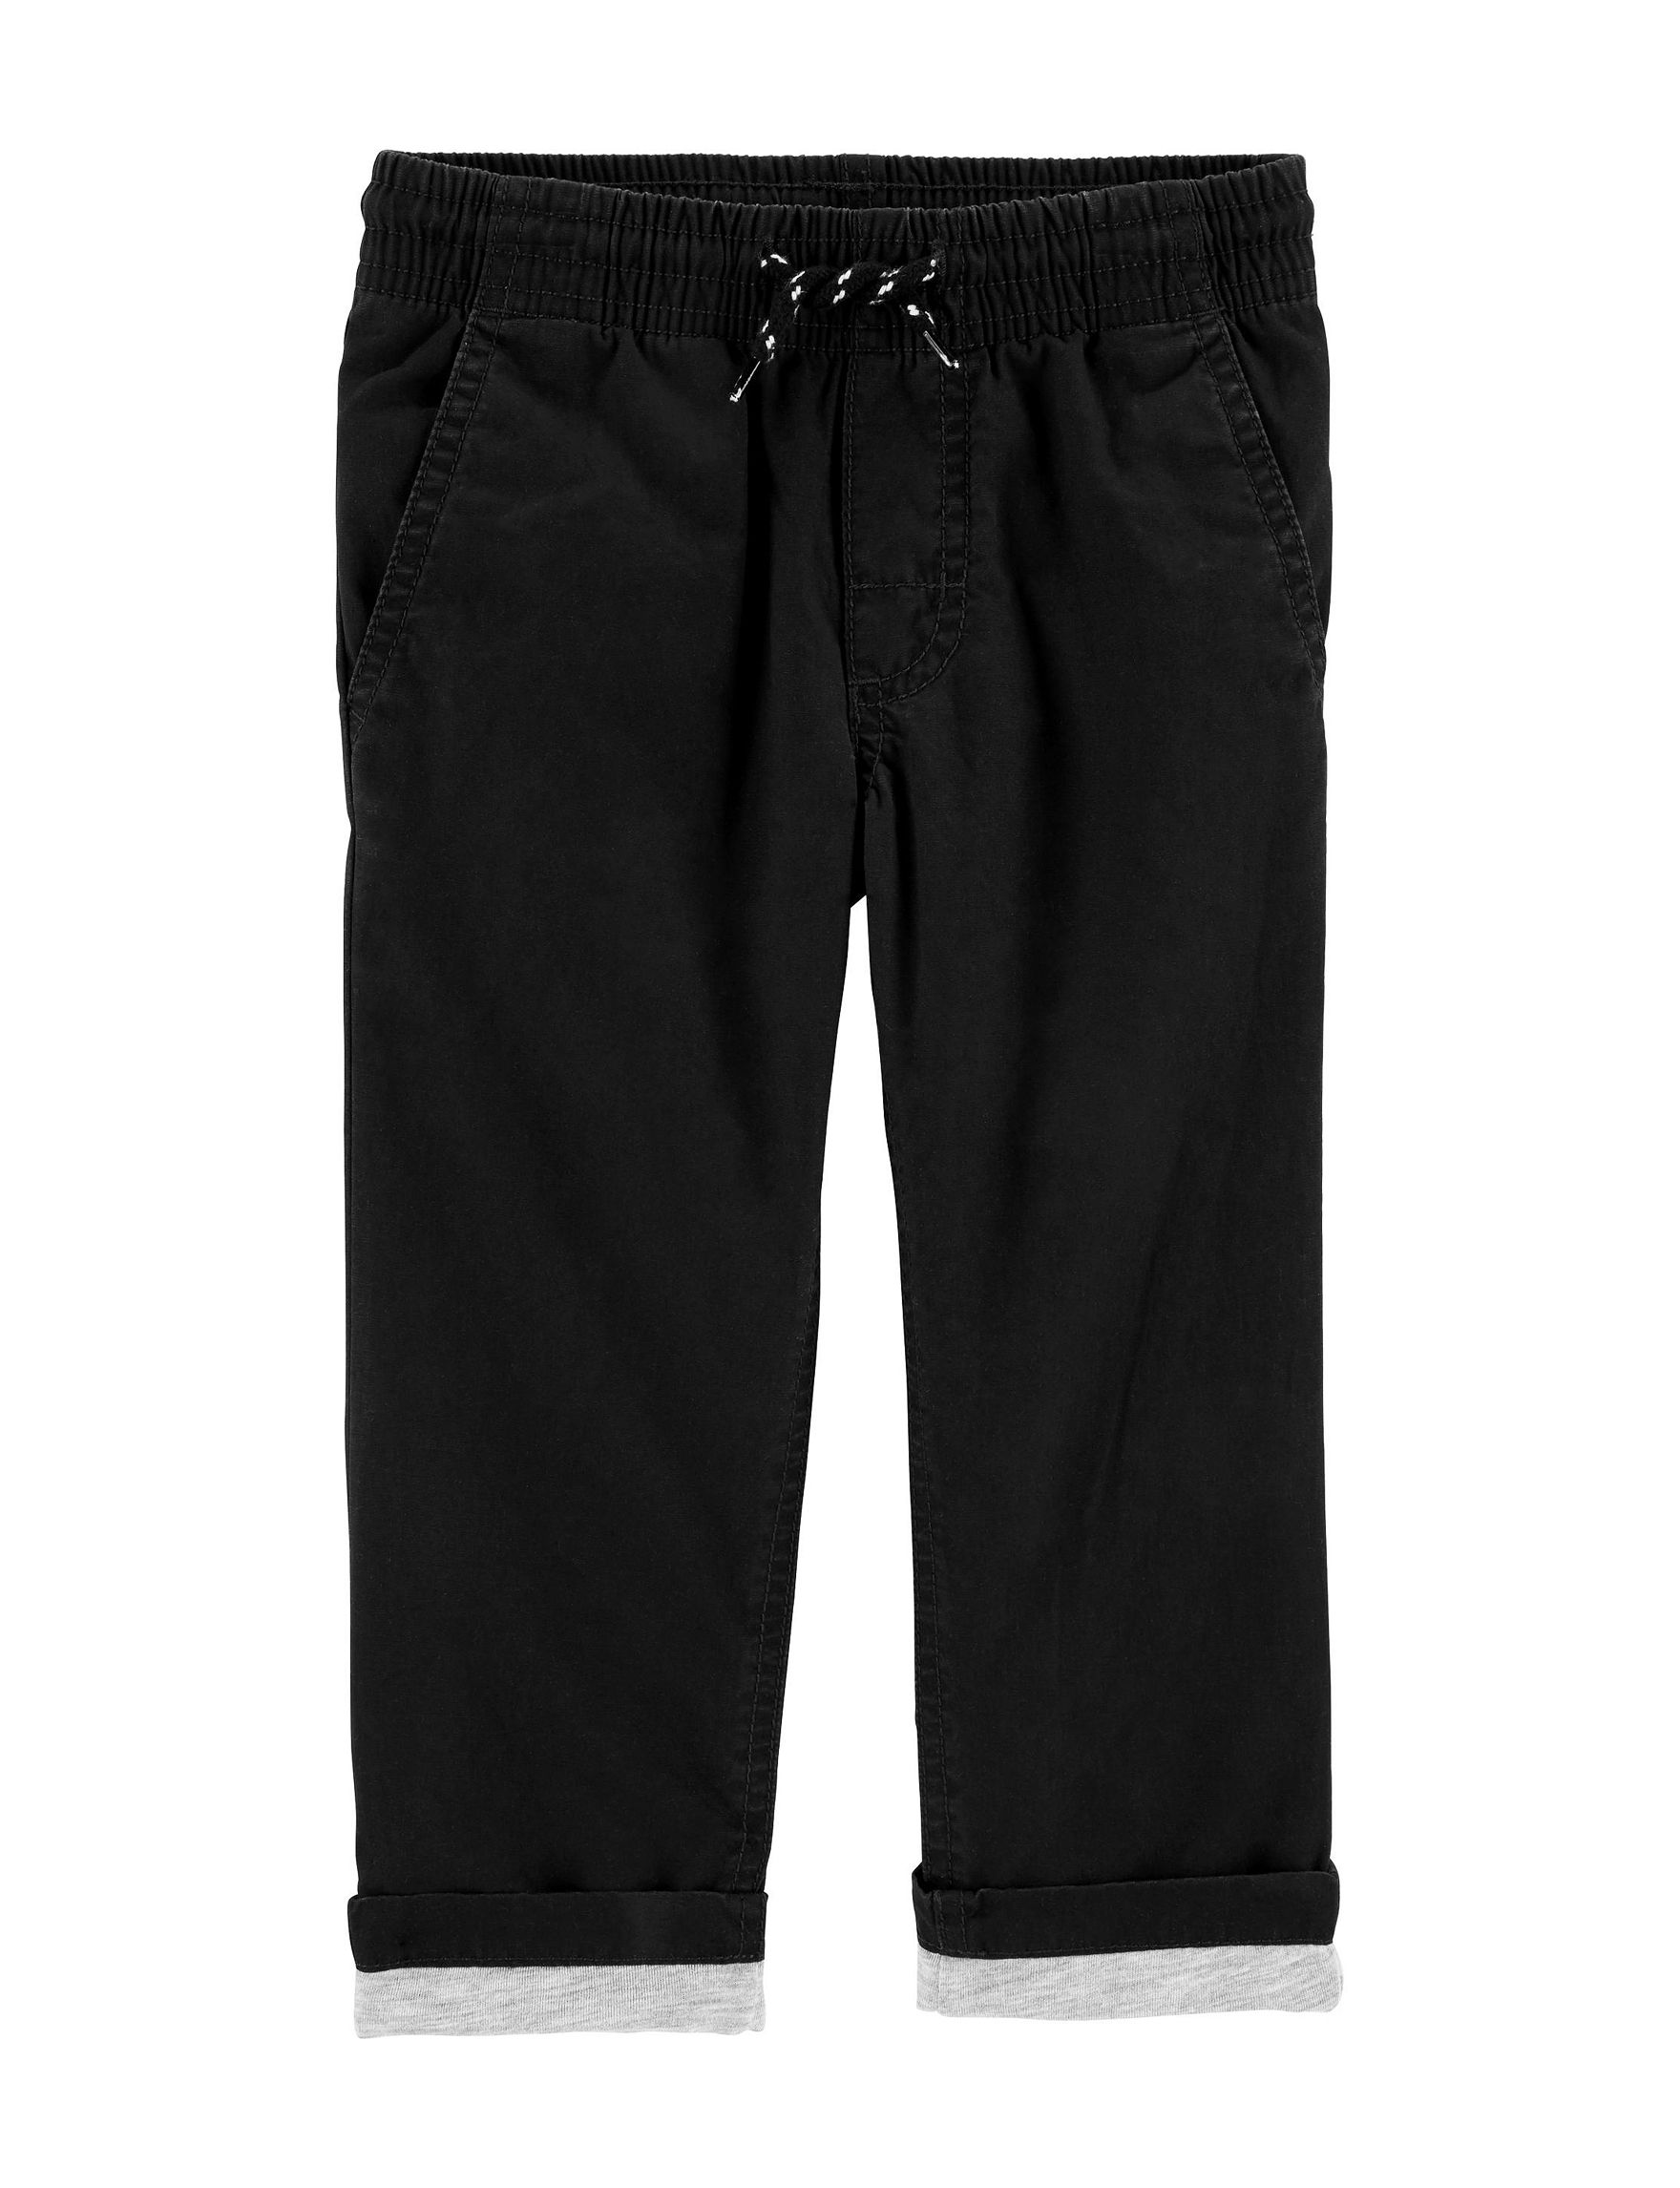 Carter's Black Soft Pants